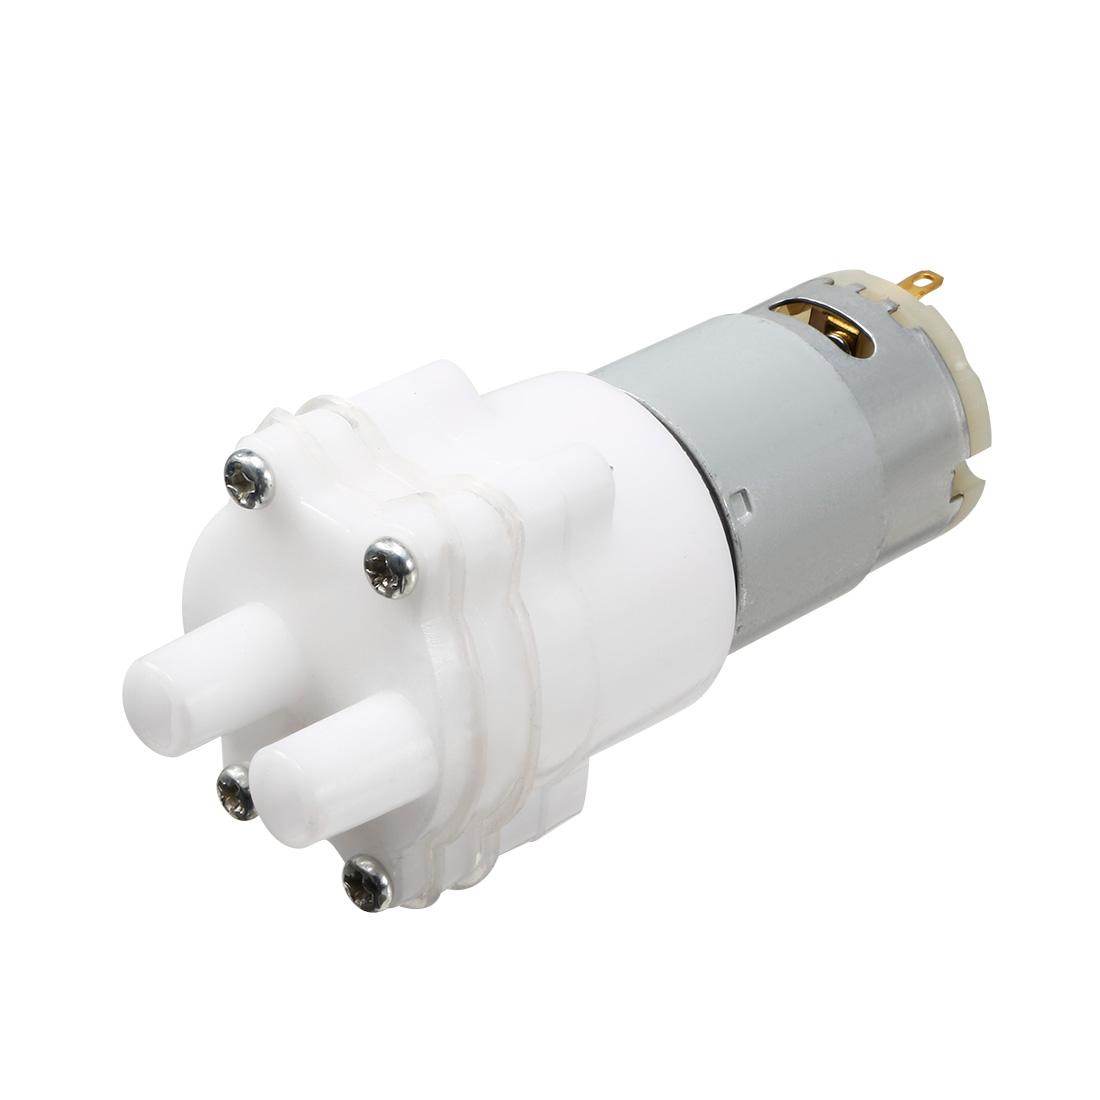 DC 12V 1.5-2 L/Min 2 Terminals Cylindrical Permanent Magnet Pump Motor